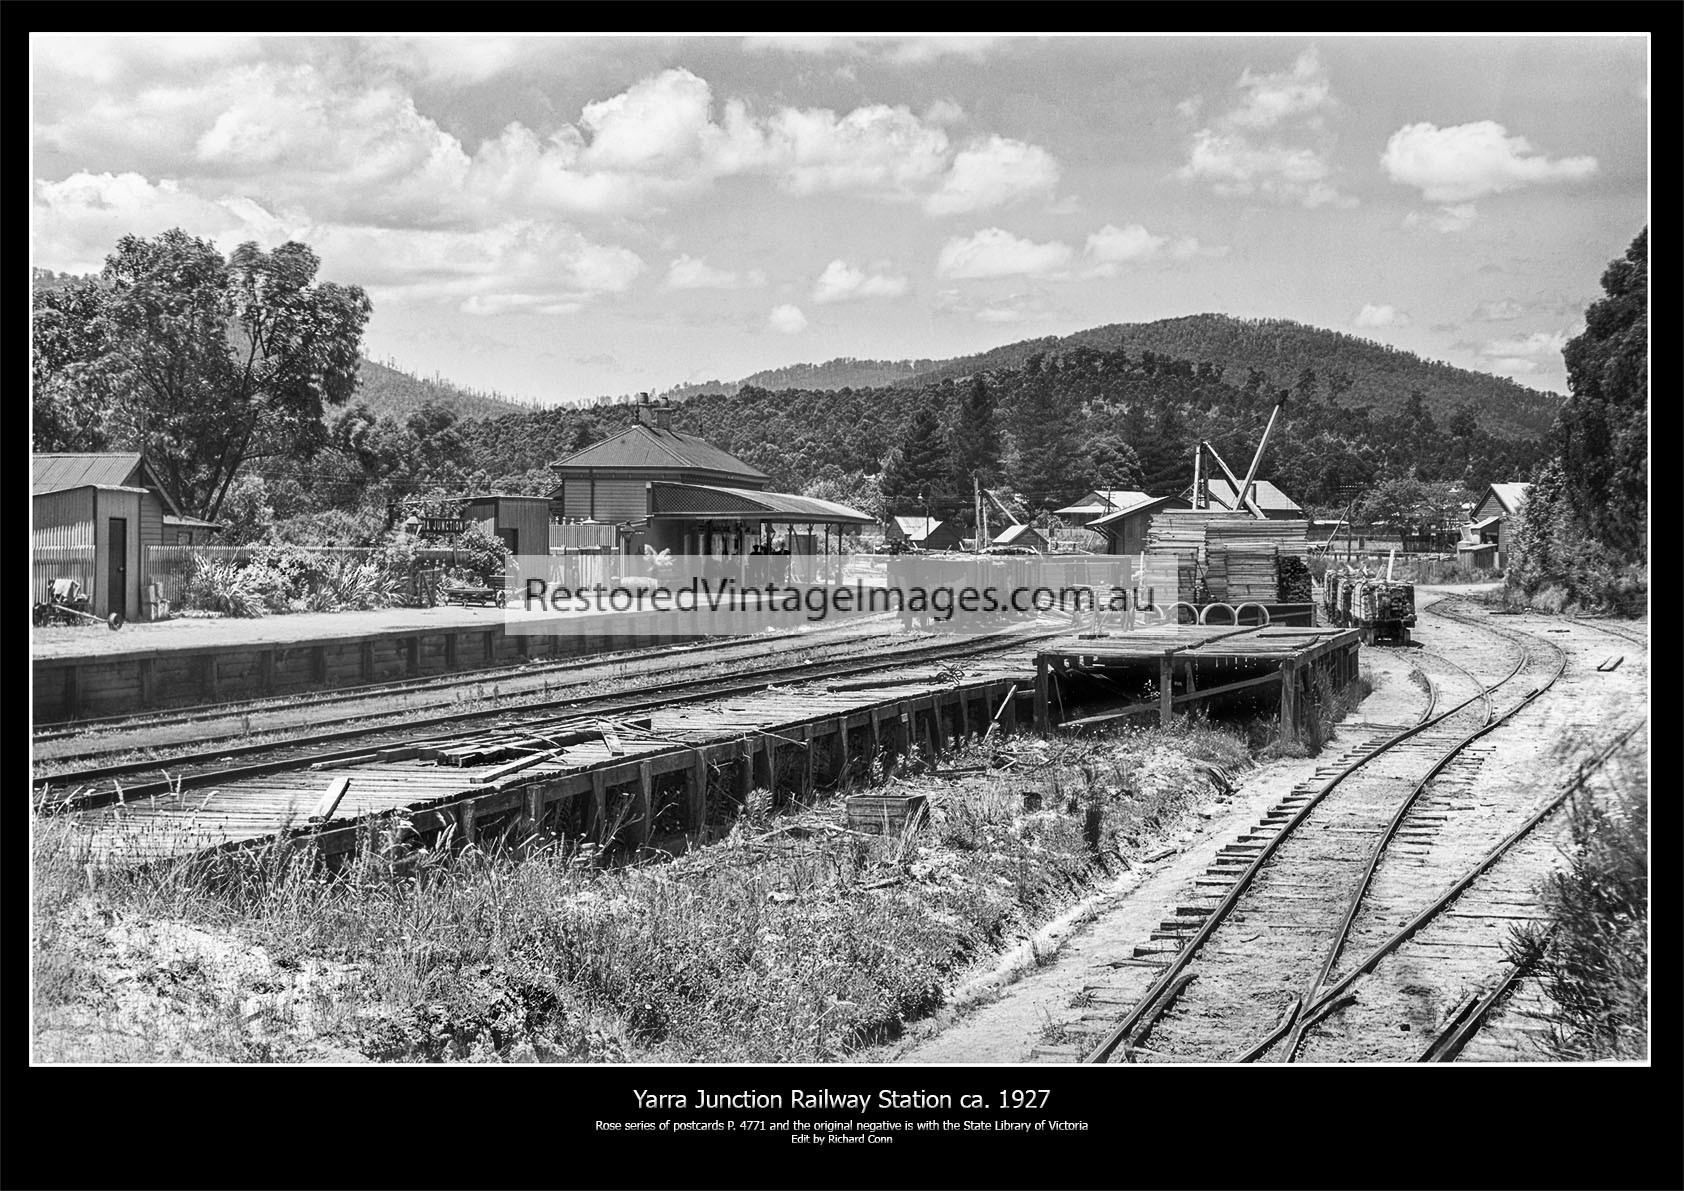 Yarra Junction Railway Station Ca. 1927